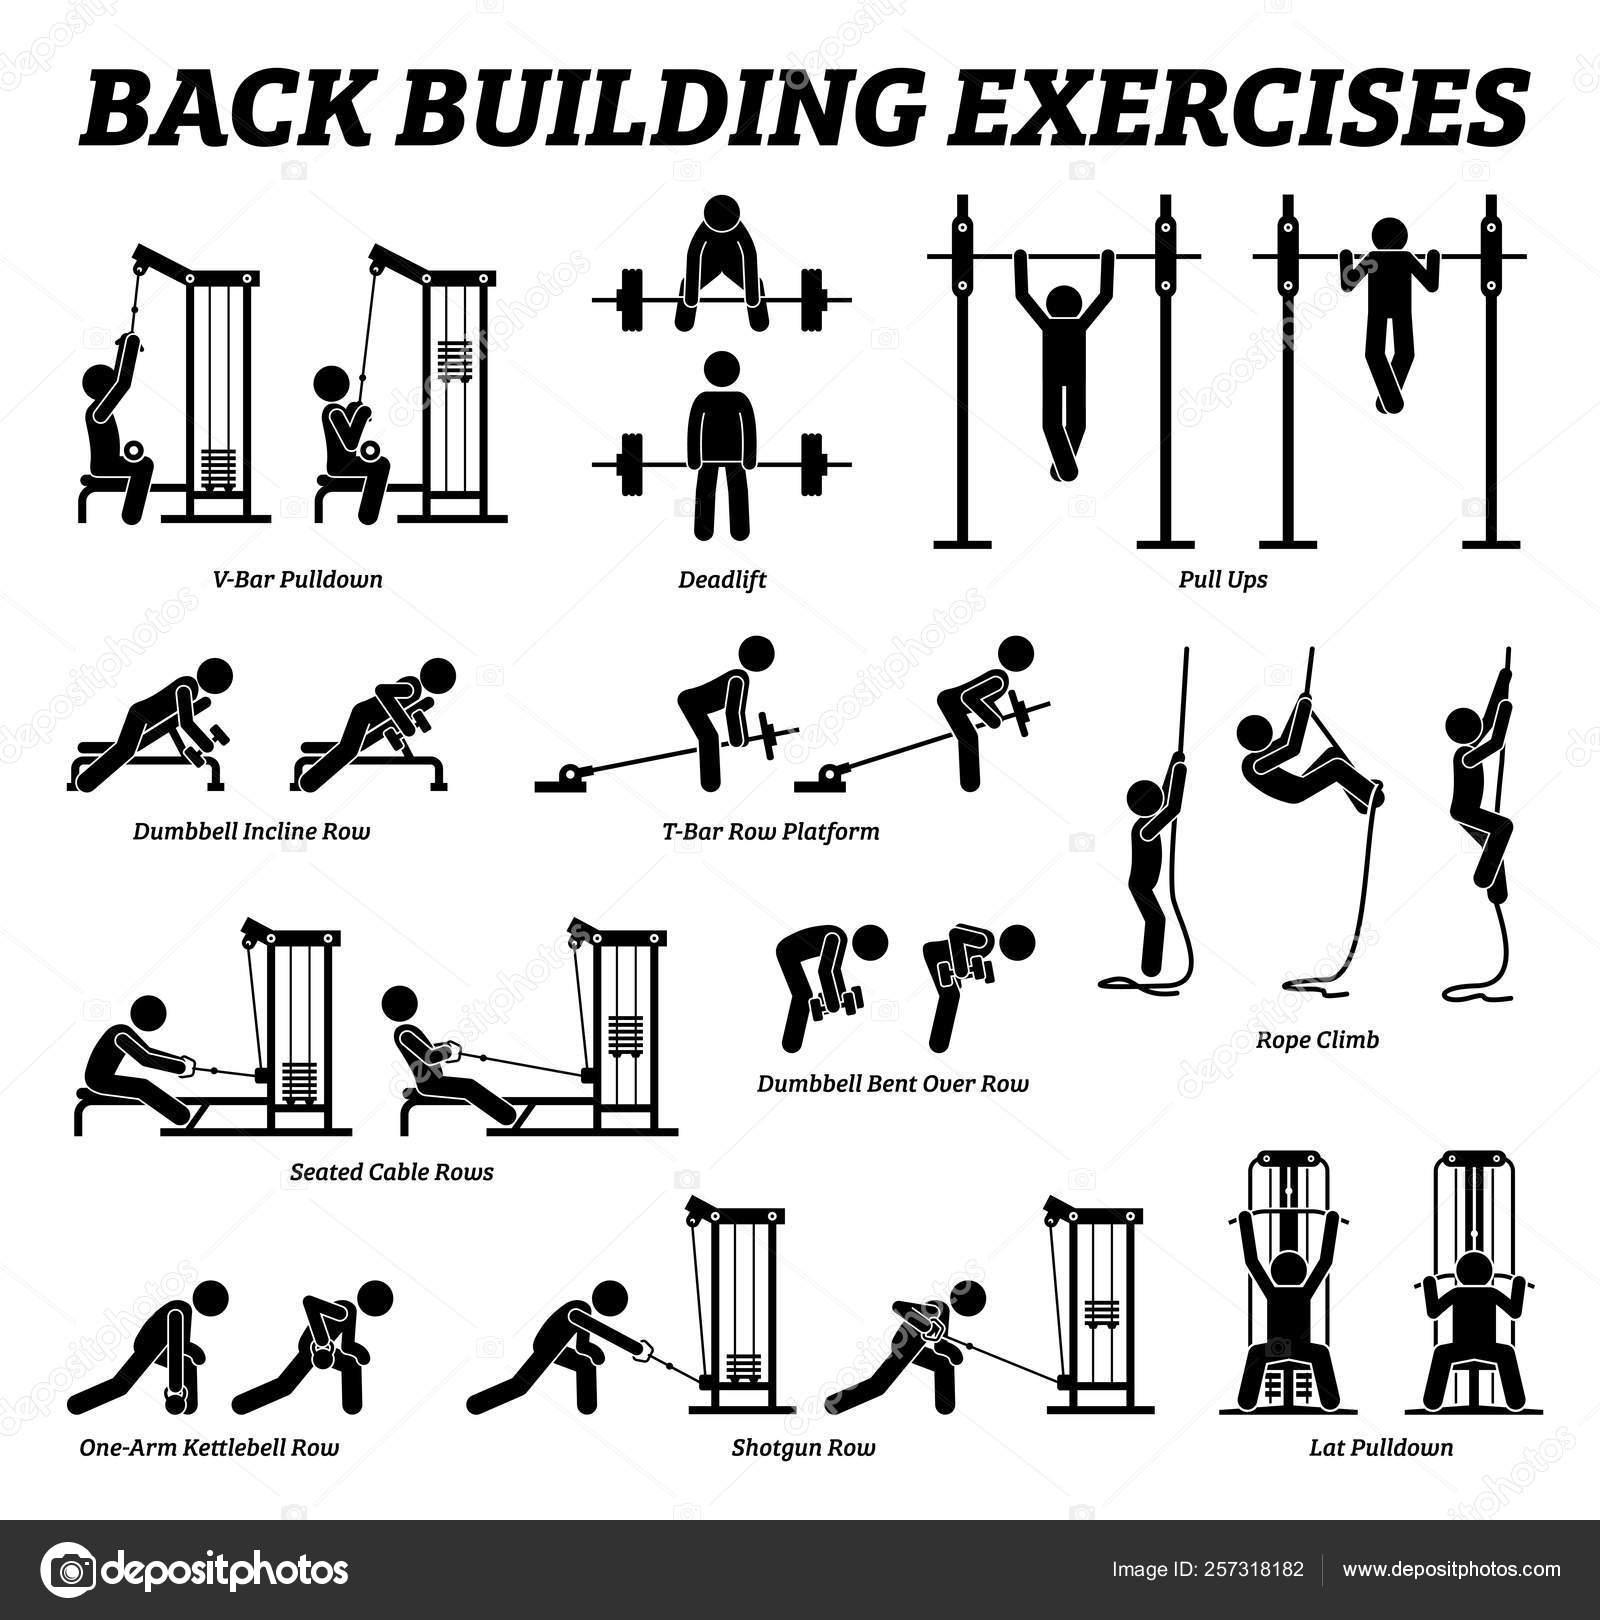 Back Building Exercises Muscle Building Stick Figure Pictograms Artworks Depict Stock Vector C Leremy 257318182